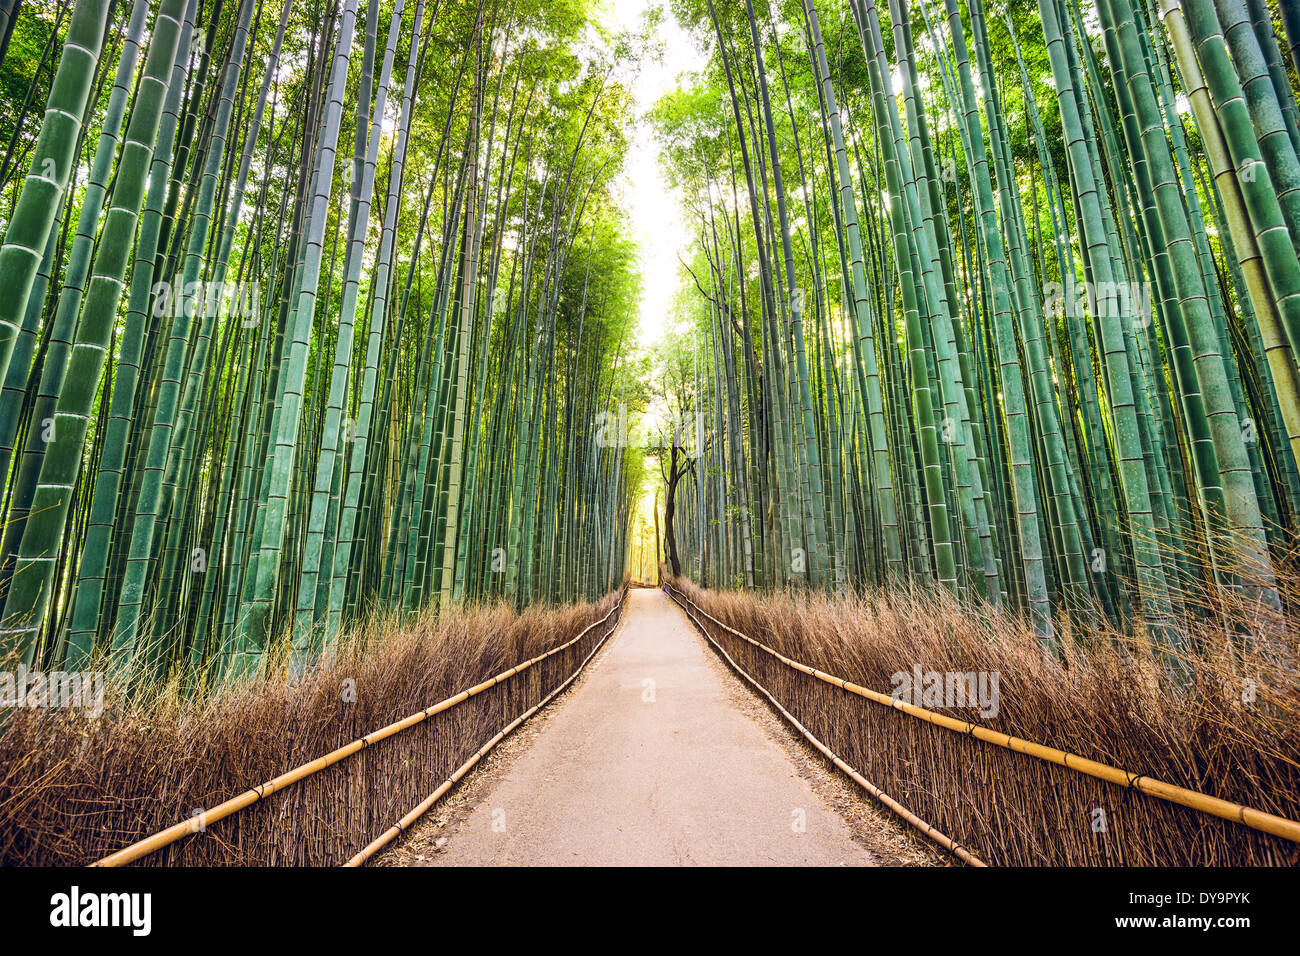 Bambus-Wald von Kyoto, Japan. Stockbild